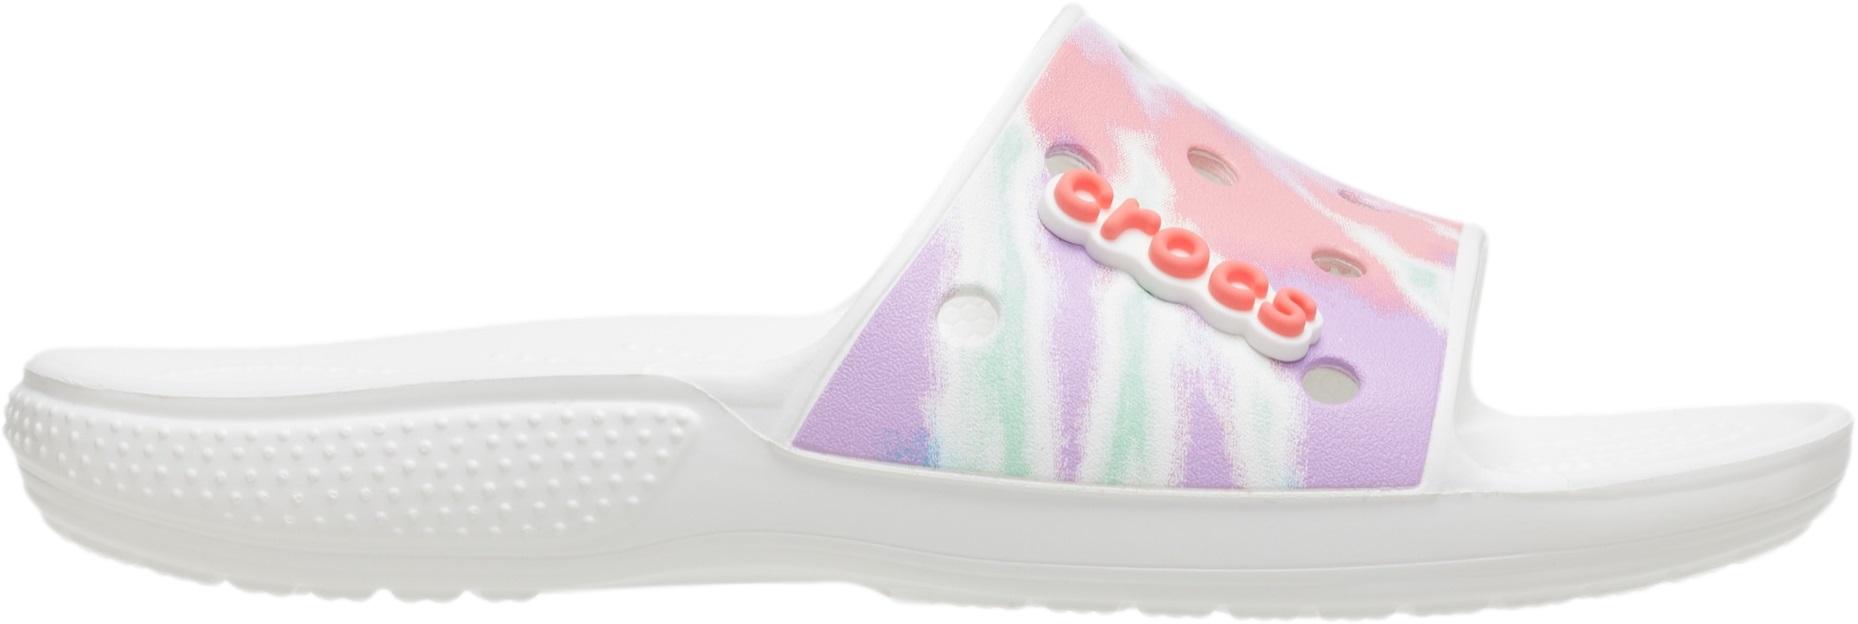 Crocs™ Classic Tie-Dye Graphic Slide Fresco/Multi 38,5